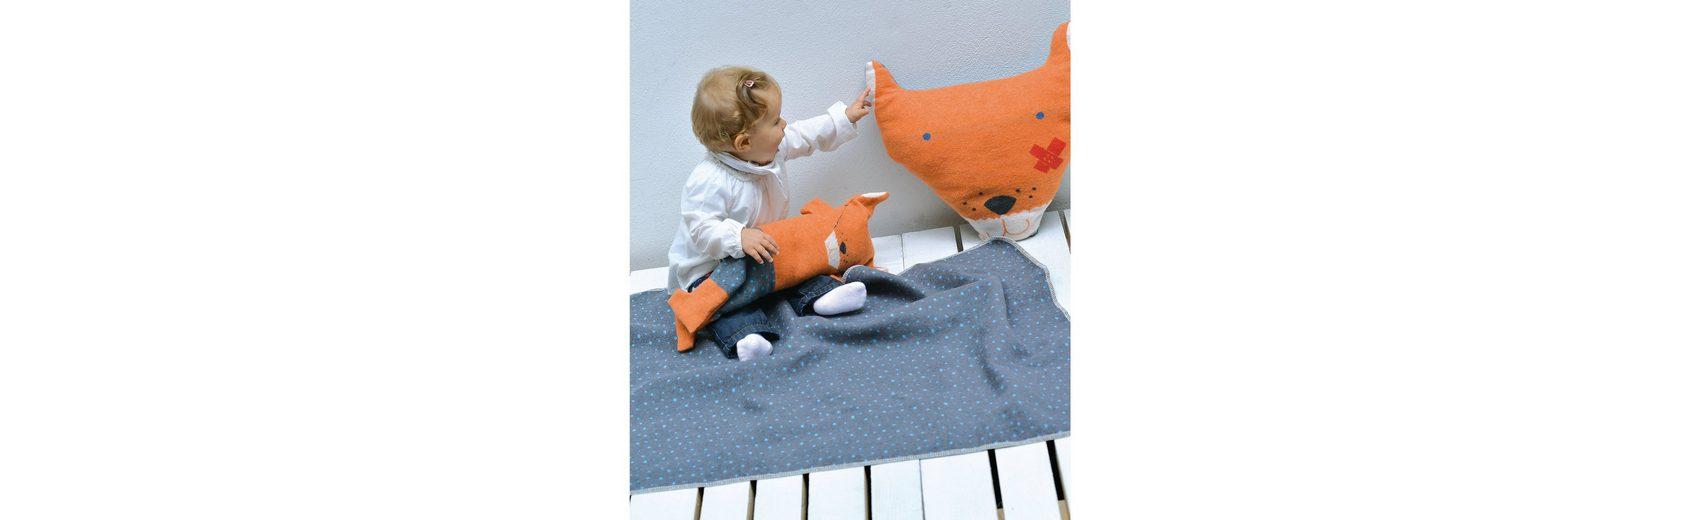 David Fussenegger Babydecke Juwel Fuchs, Decke in Puppe, 70 x 90 cm